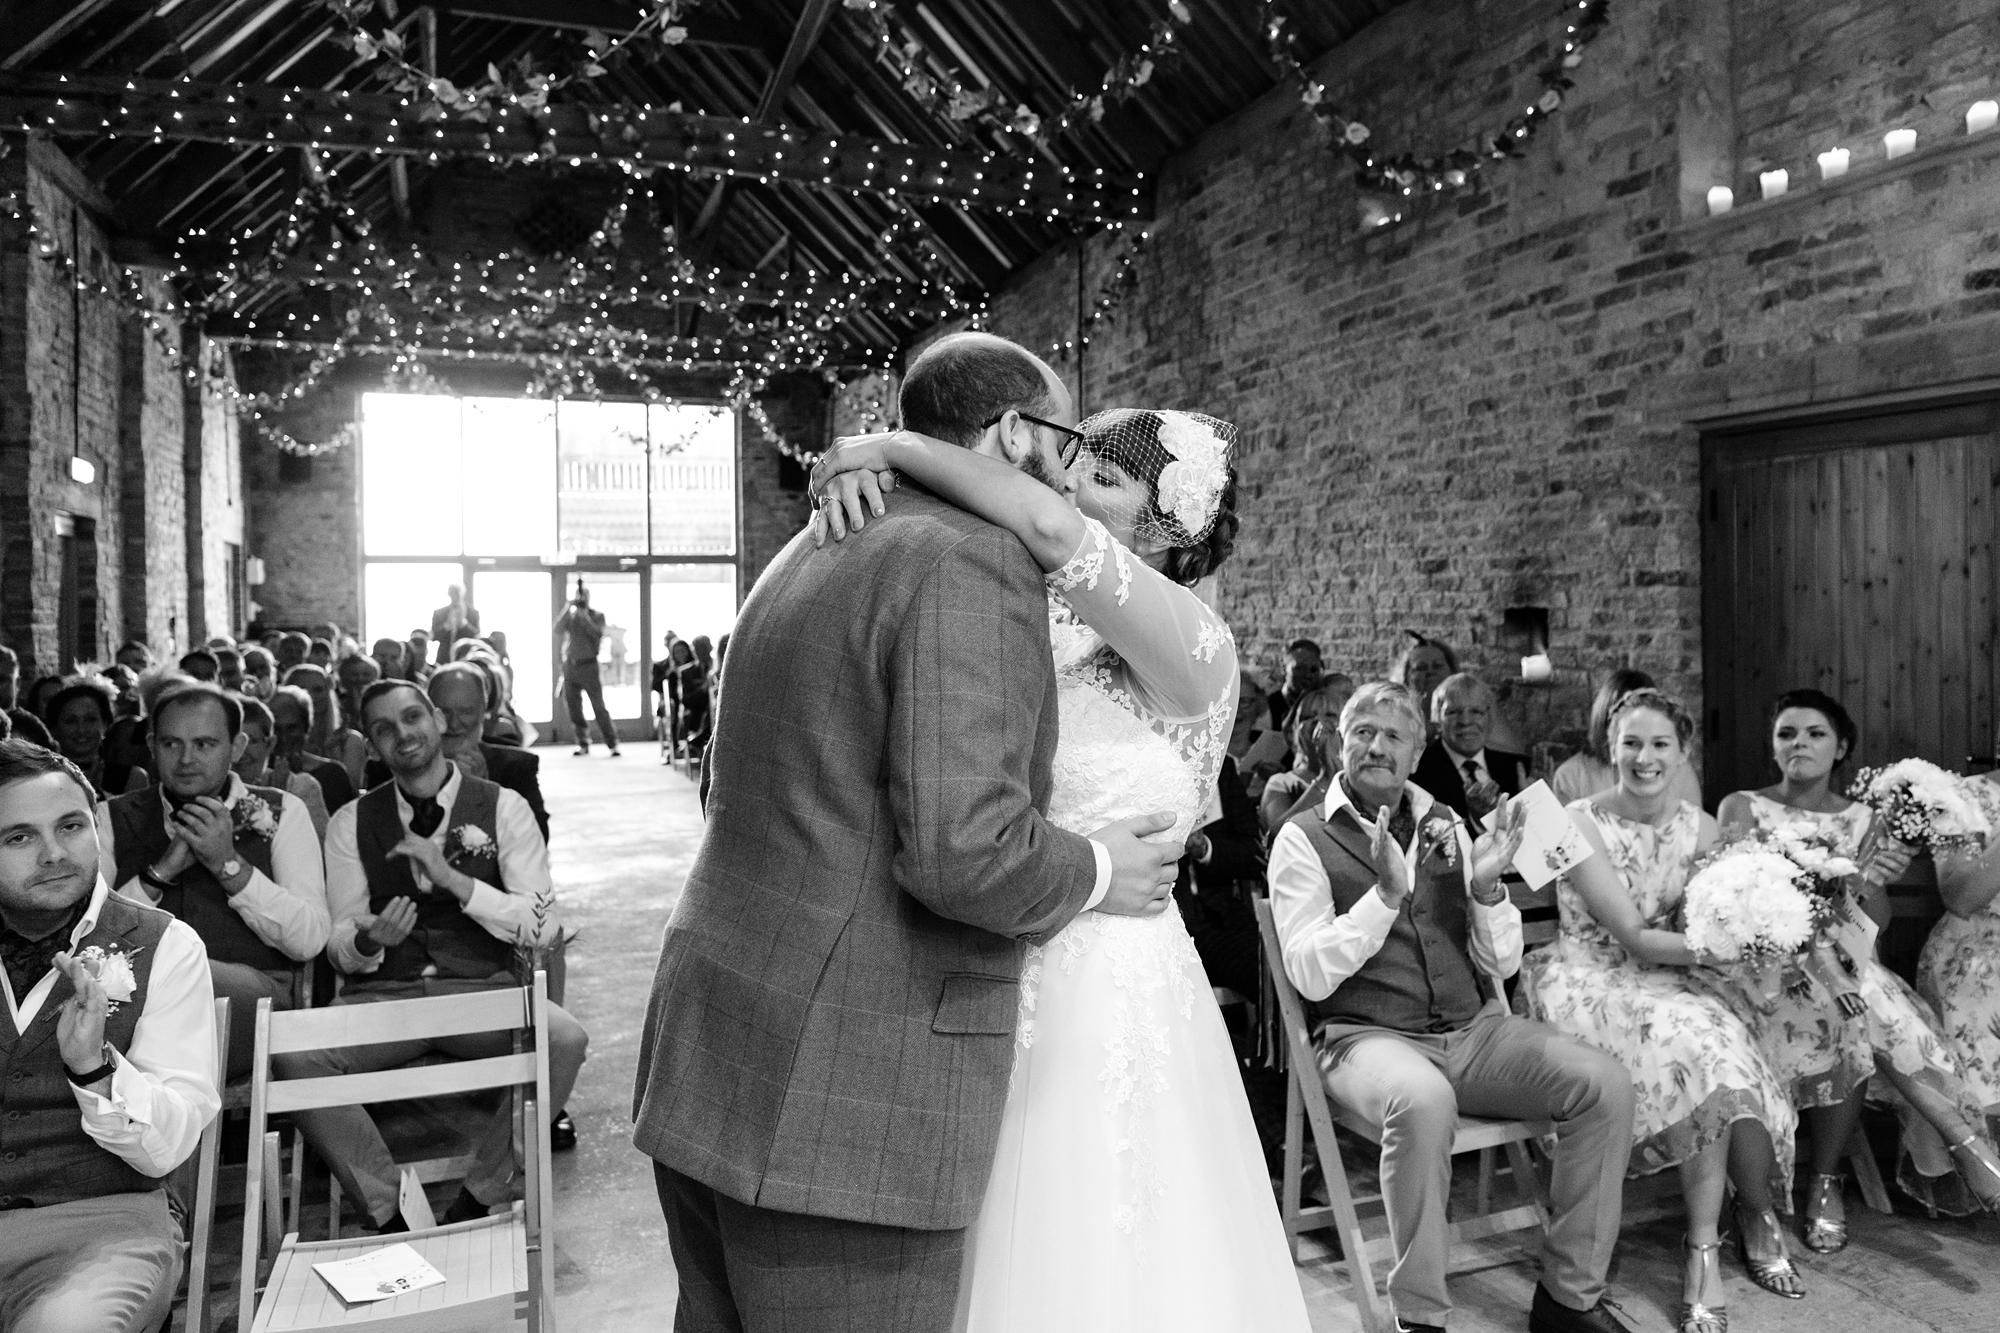 York Wedding Photography at Barmbyfield Barns Frist Kiss